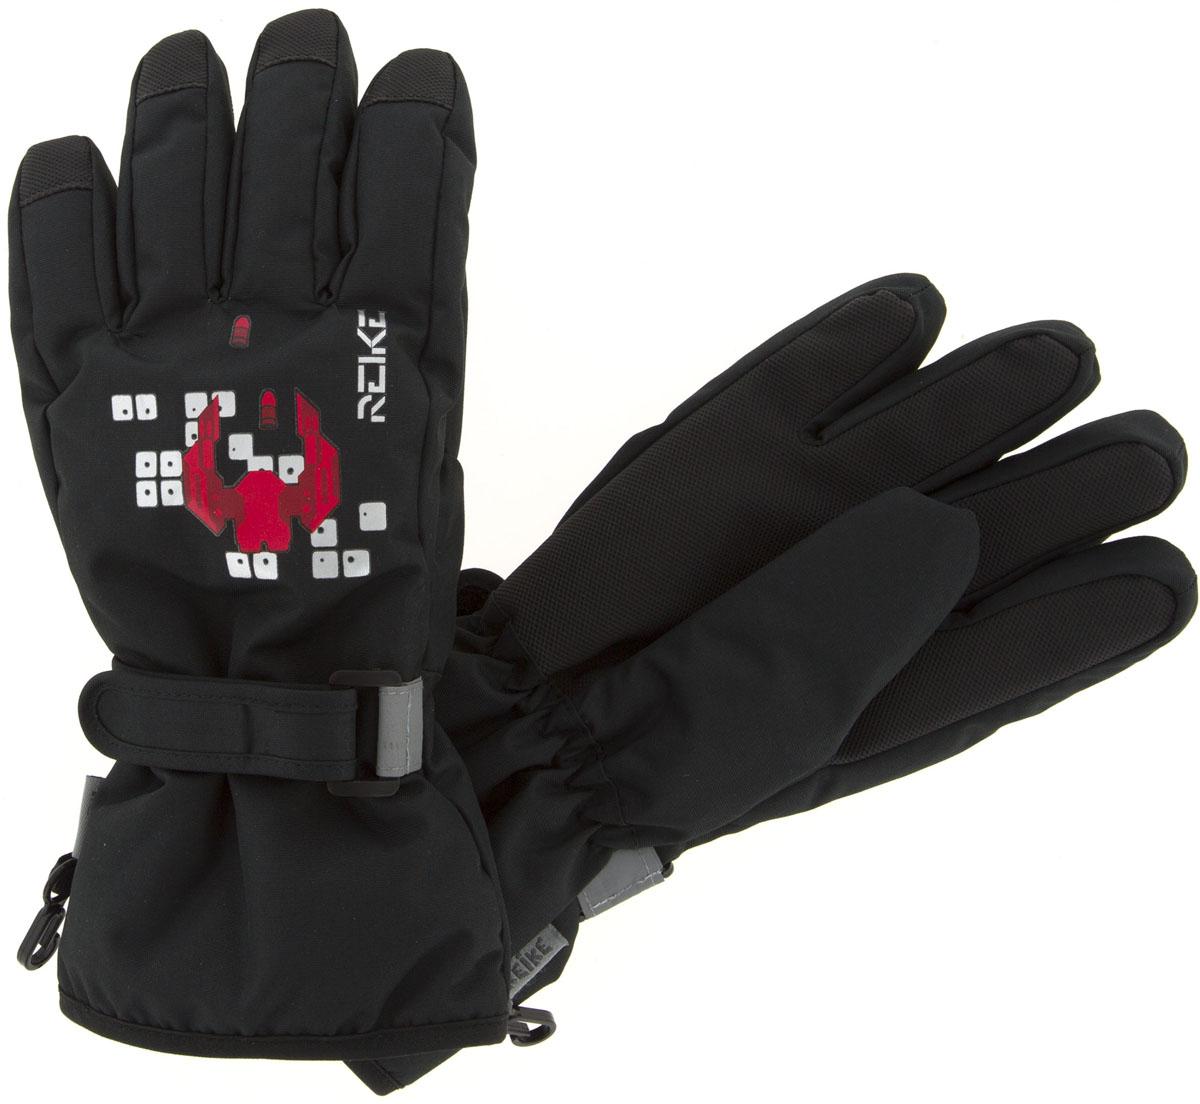 Перчатки для мальчиков Reike, цвет: черный. RW18_GLX black. Размер 8RW18_GLX black